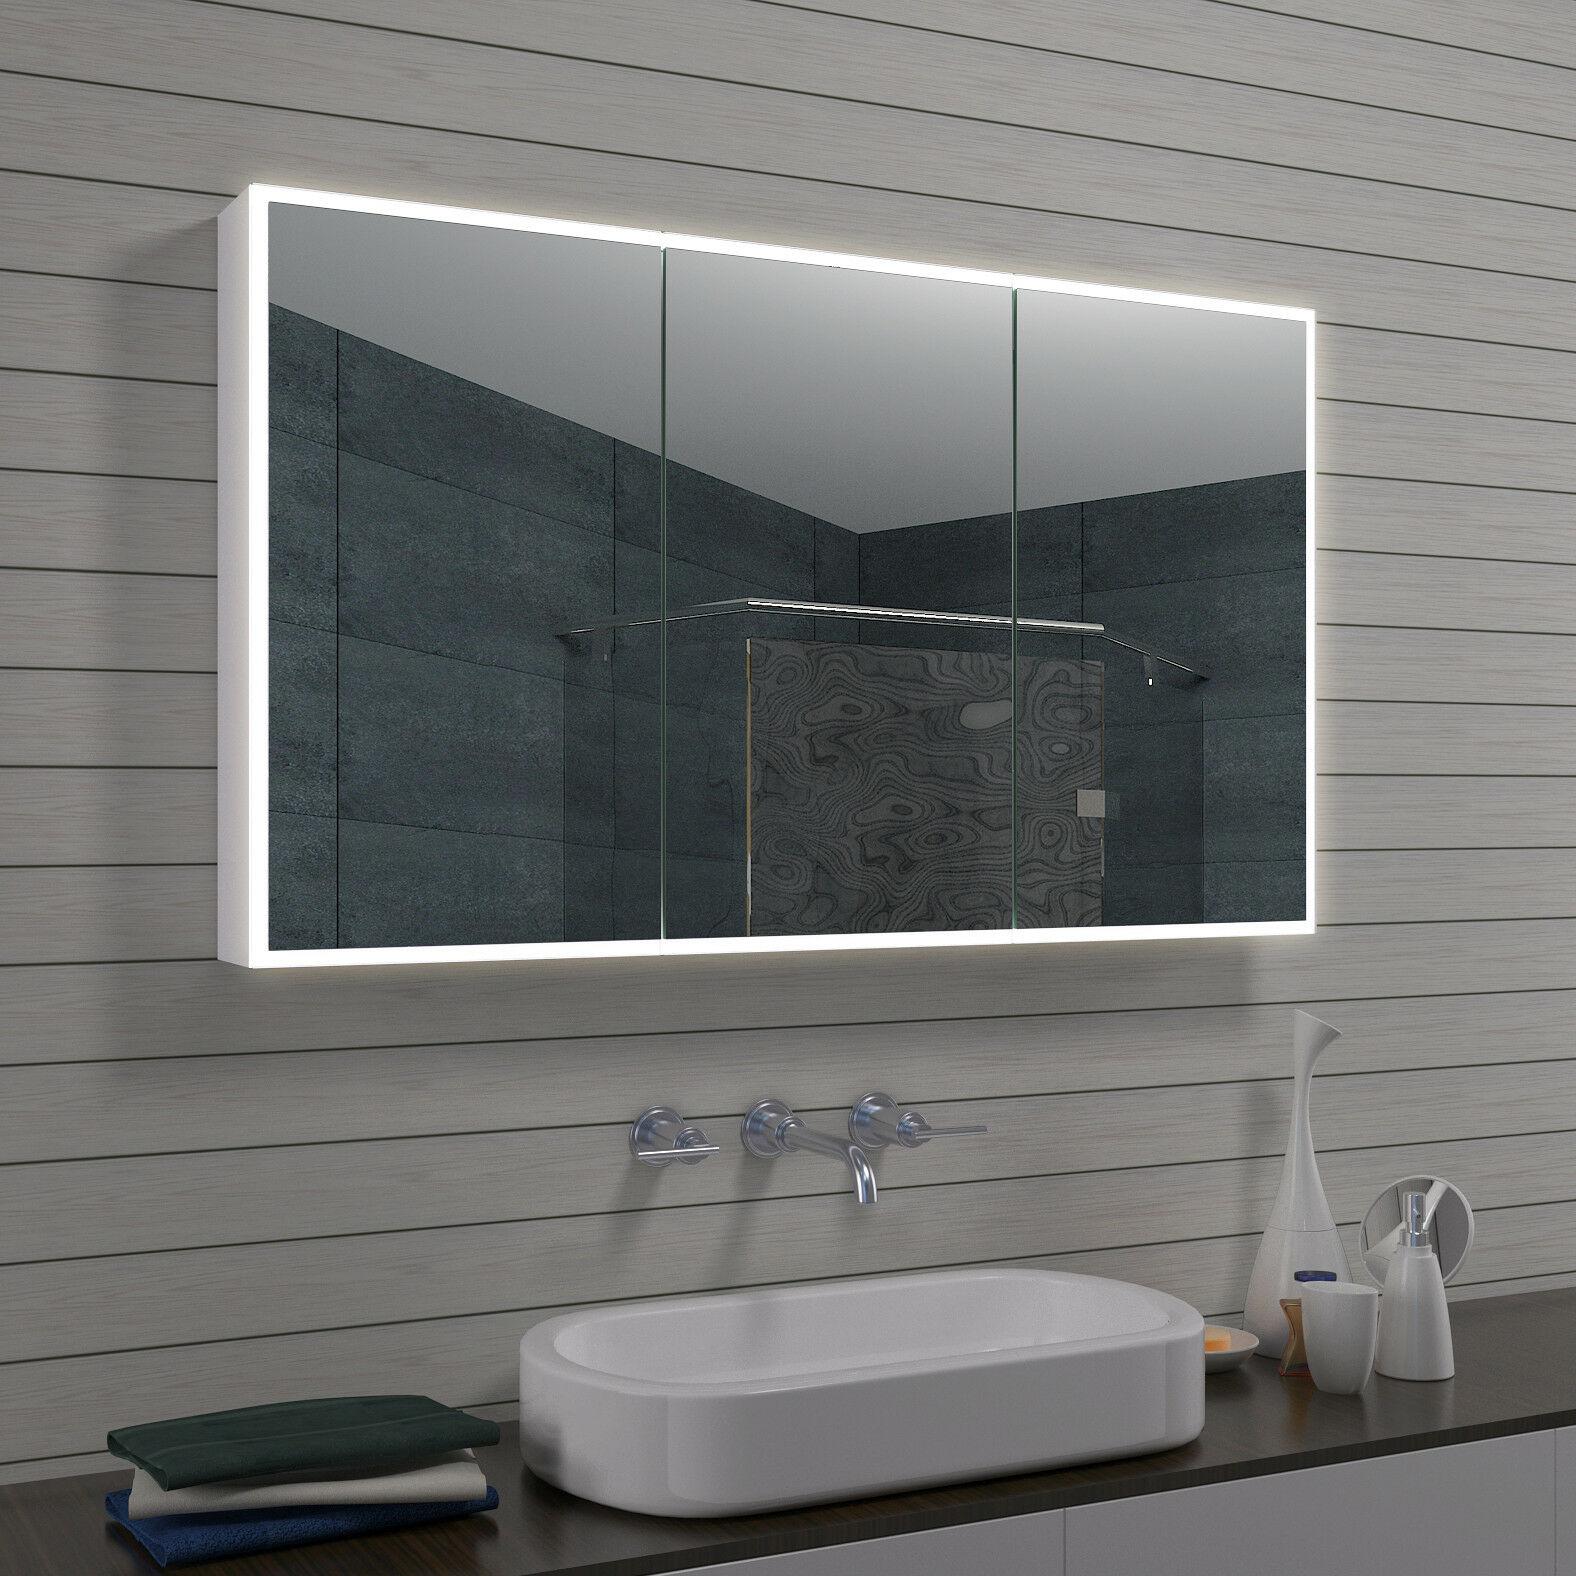 www.lux aqua.de   Aluminium LED Beleuchtung Badezimmer Spiegelschrank mit Schminkspiegel MLA1270 R